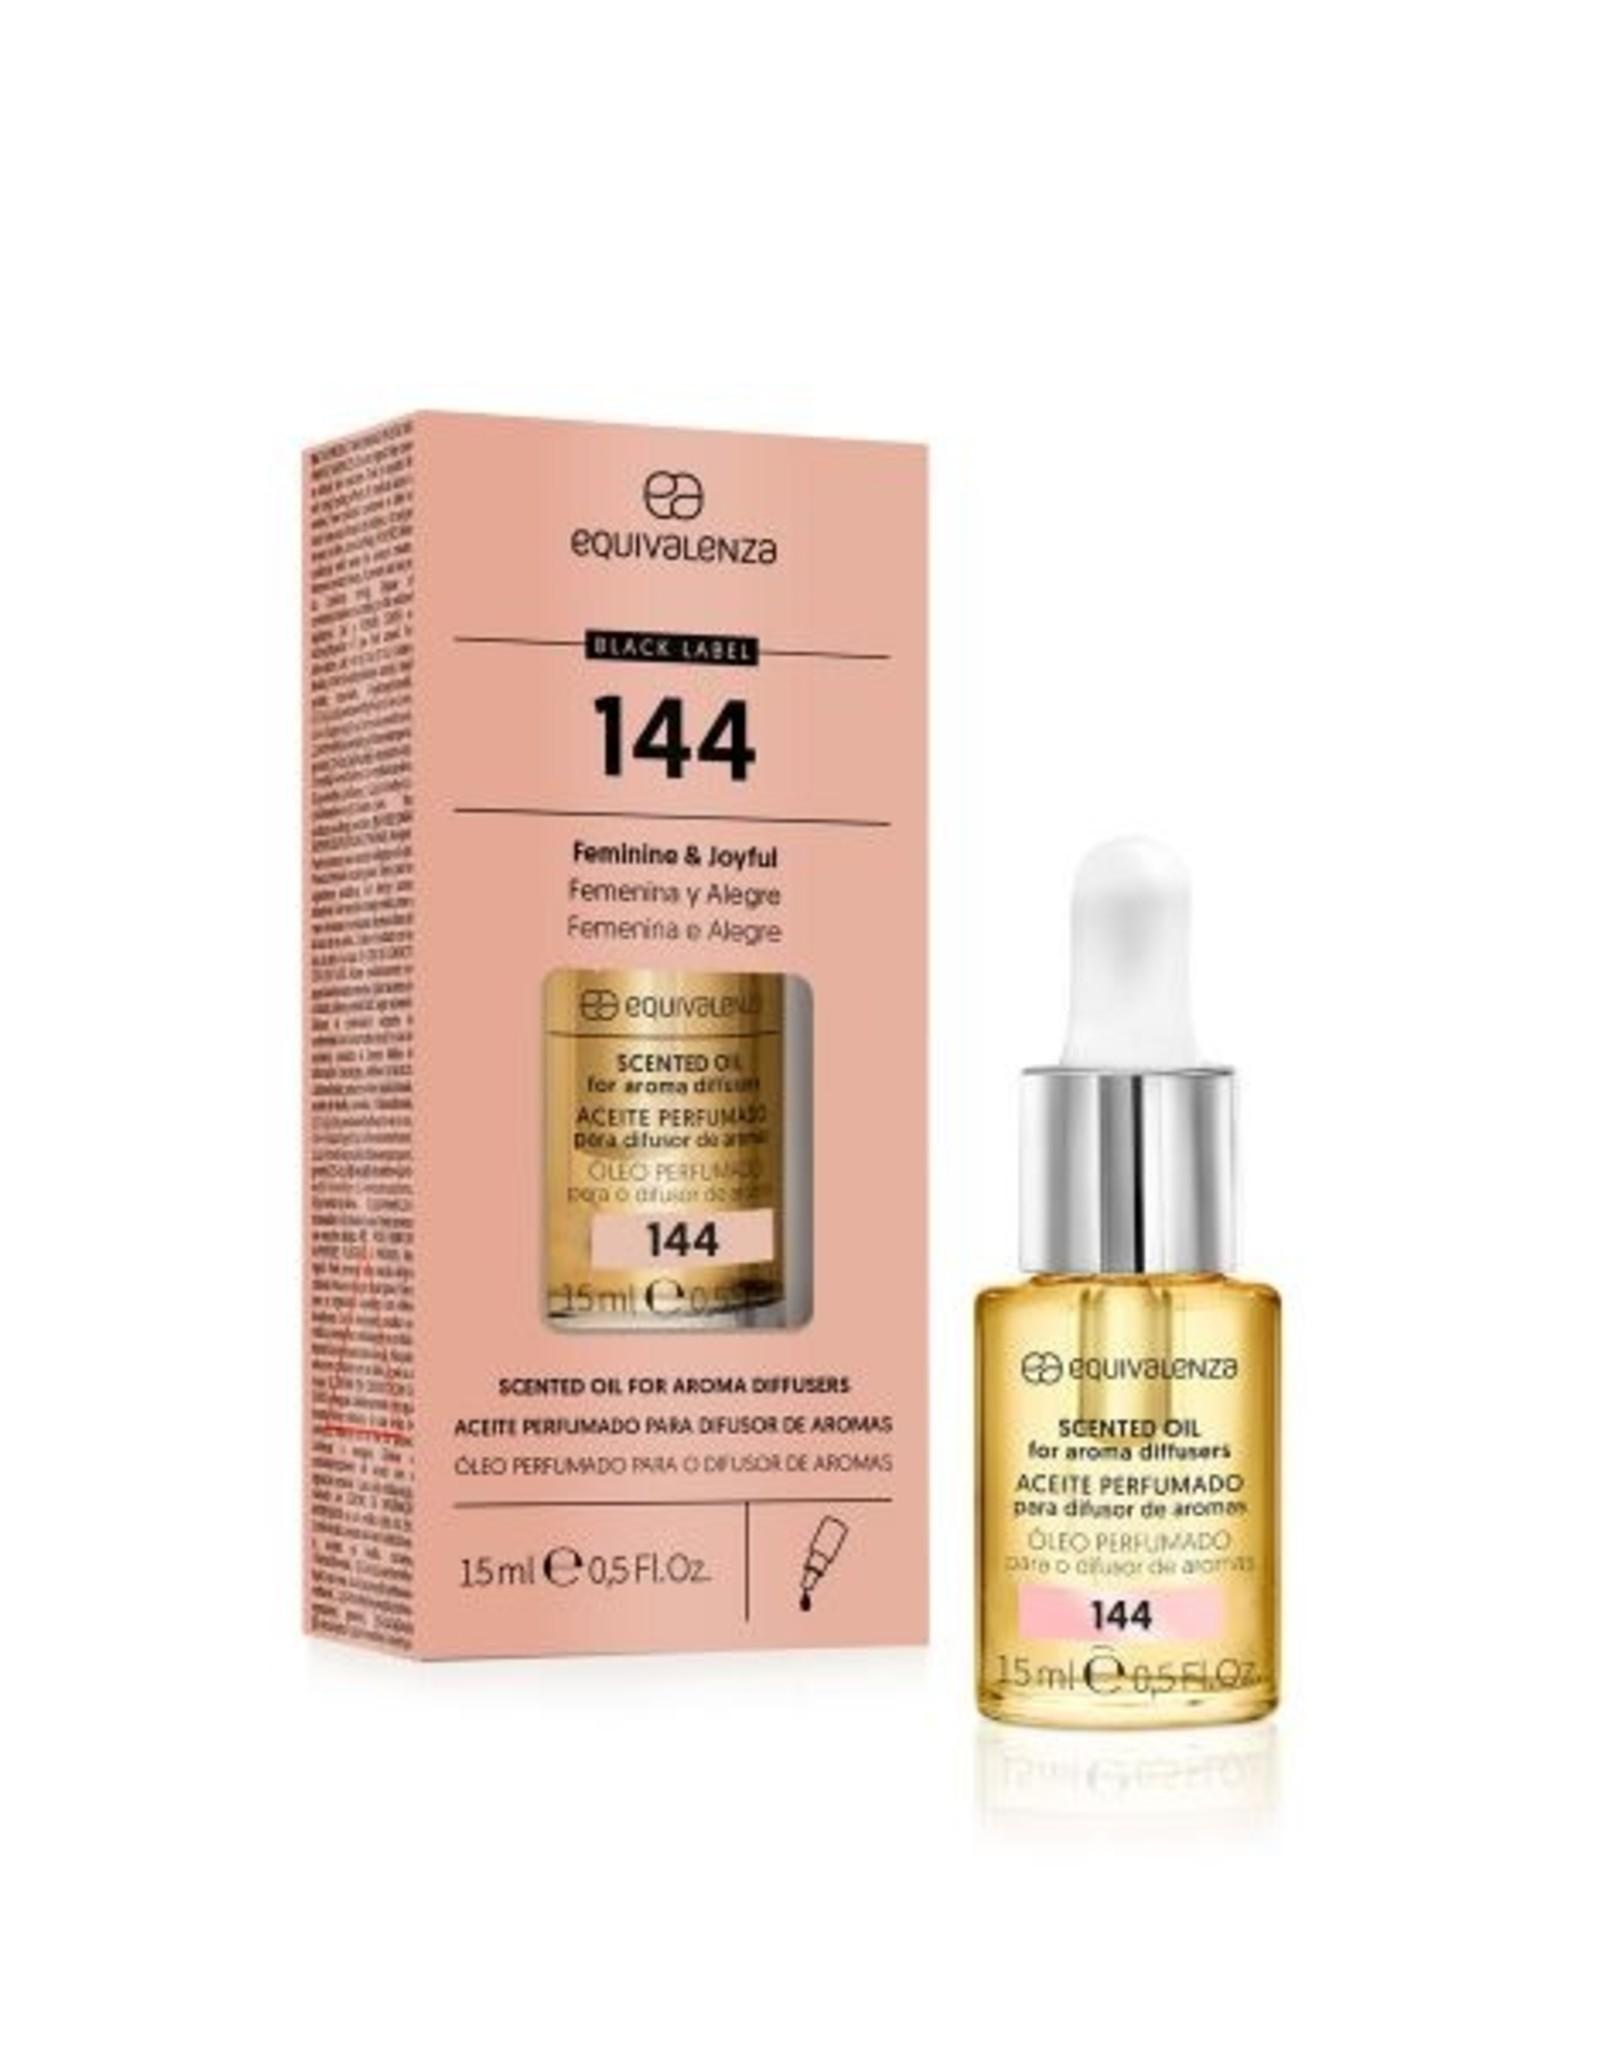 Equivalenza Huile Parfumée Hydrosoluble – Black Label nº 144